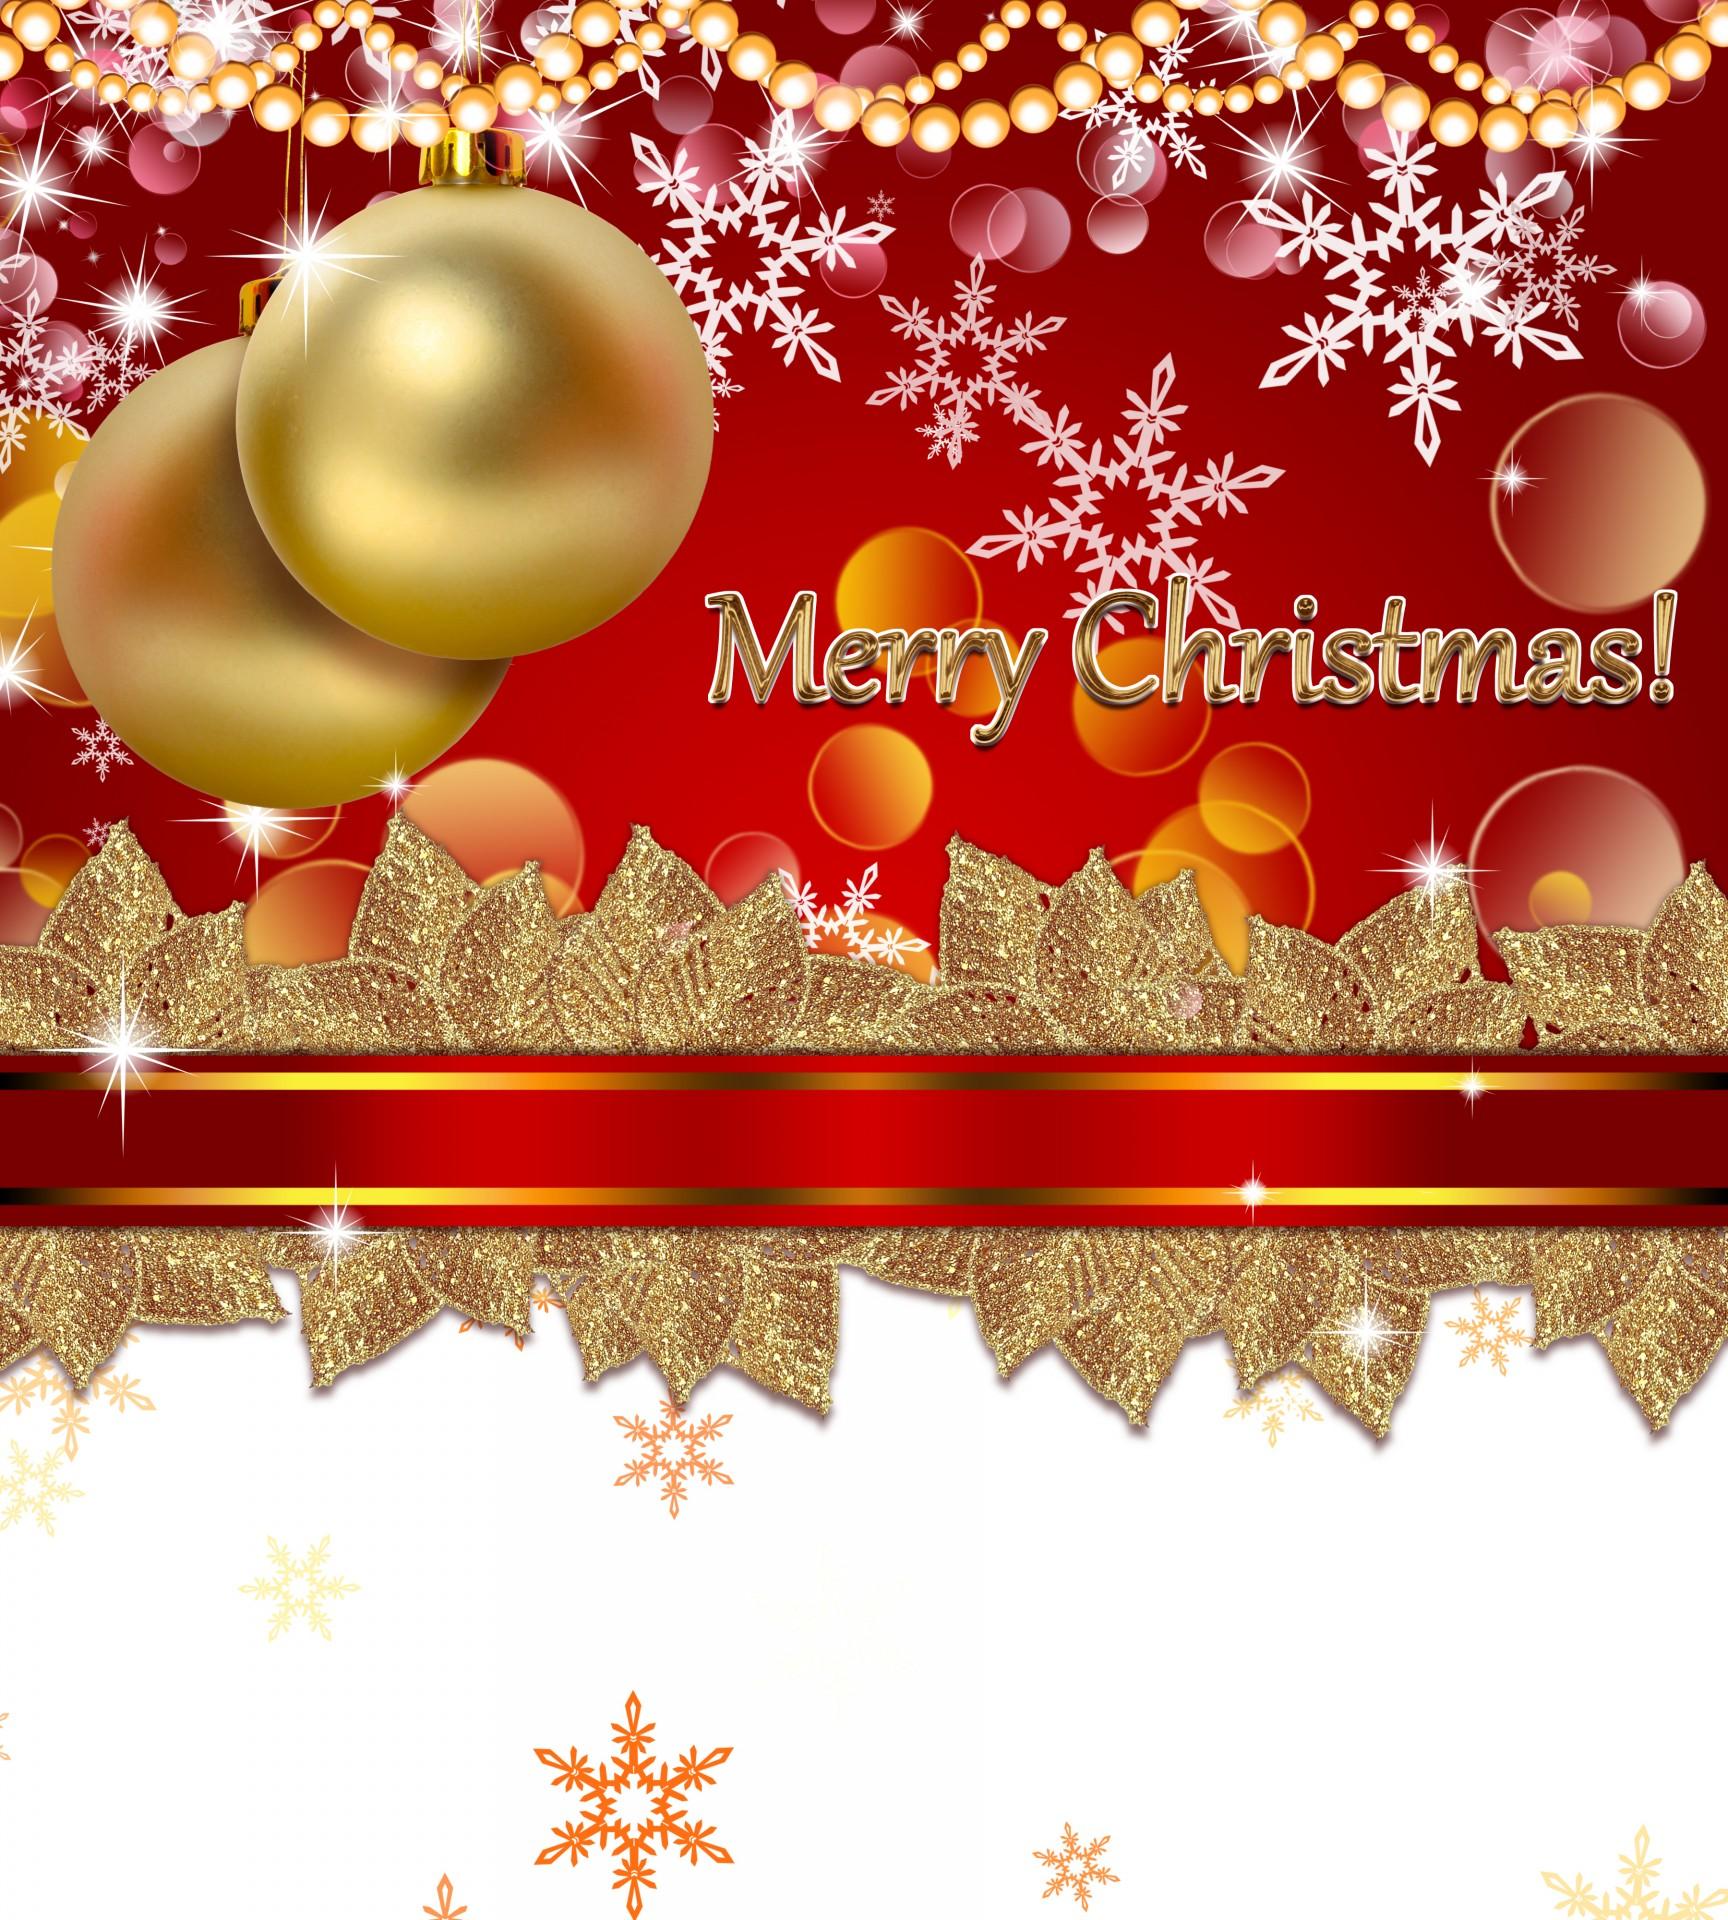 Merry Christmas Free Stock Photo